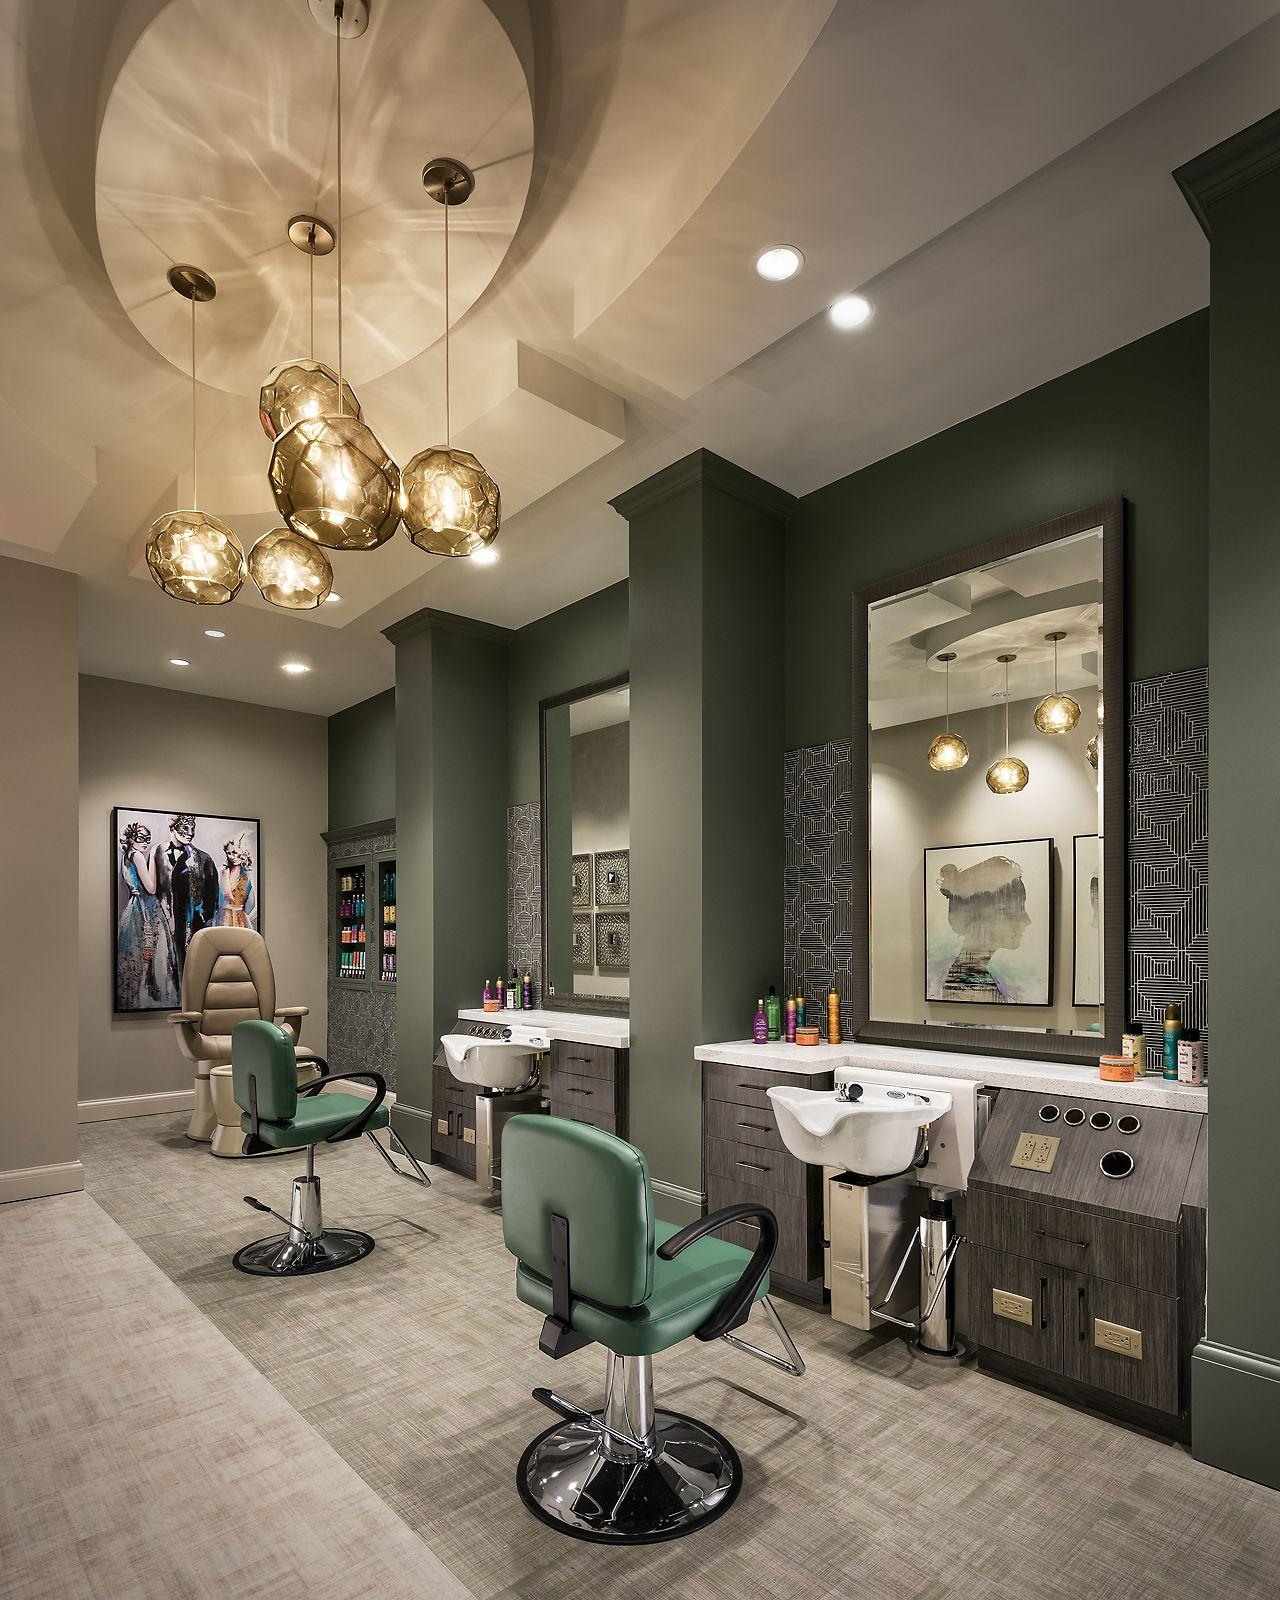 Home Design Ideas For Seniors: Senior Living Design, Senior Living Interior